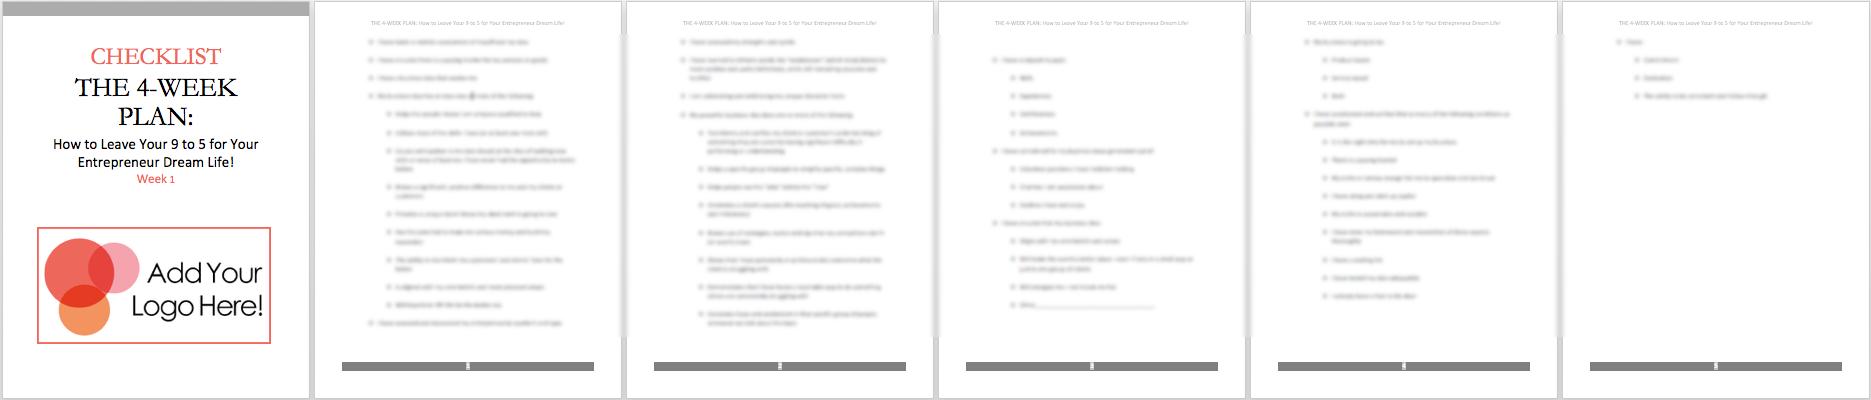 1-checklist